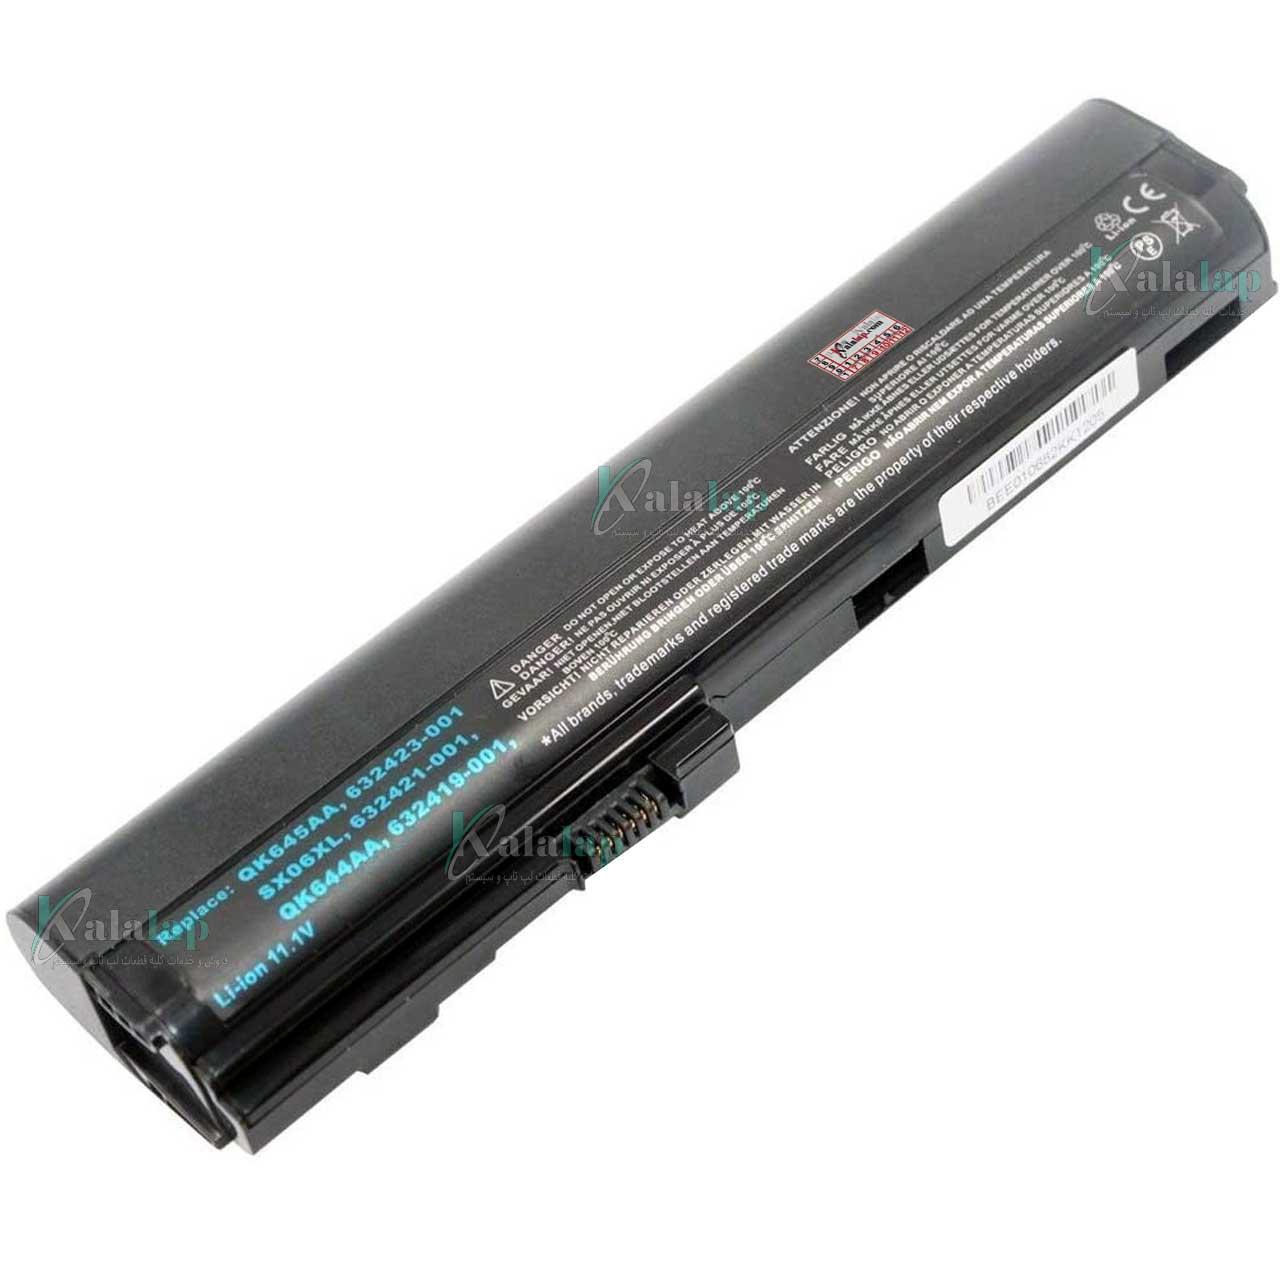 باتری لپ تاپ اچ پی Battery Laptop HP-2560P